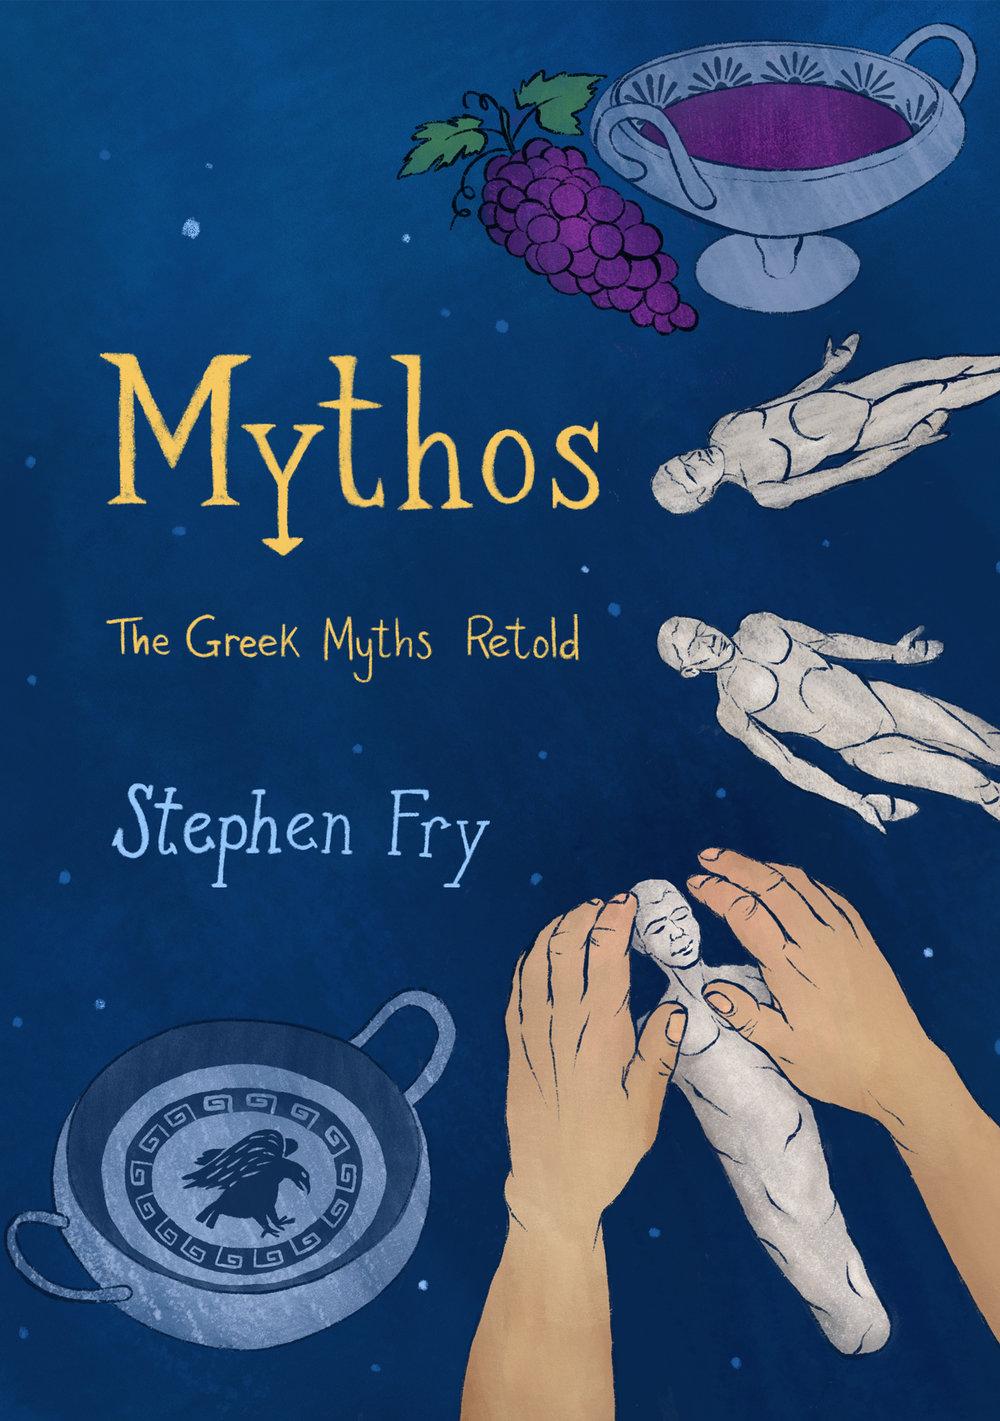 mythos-cover-2.jpg